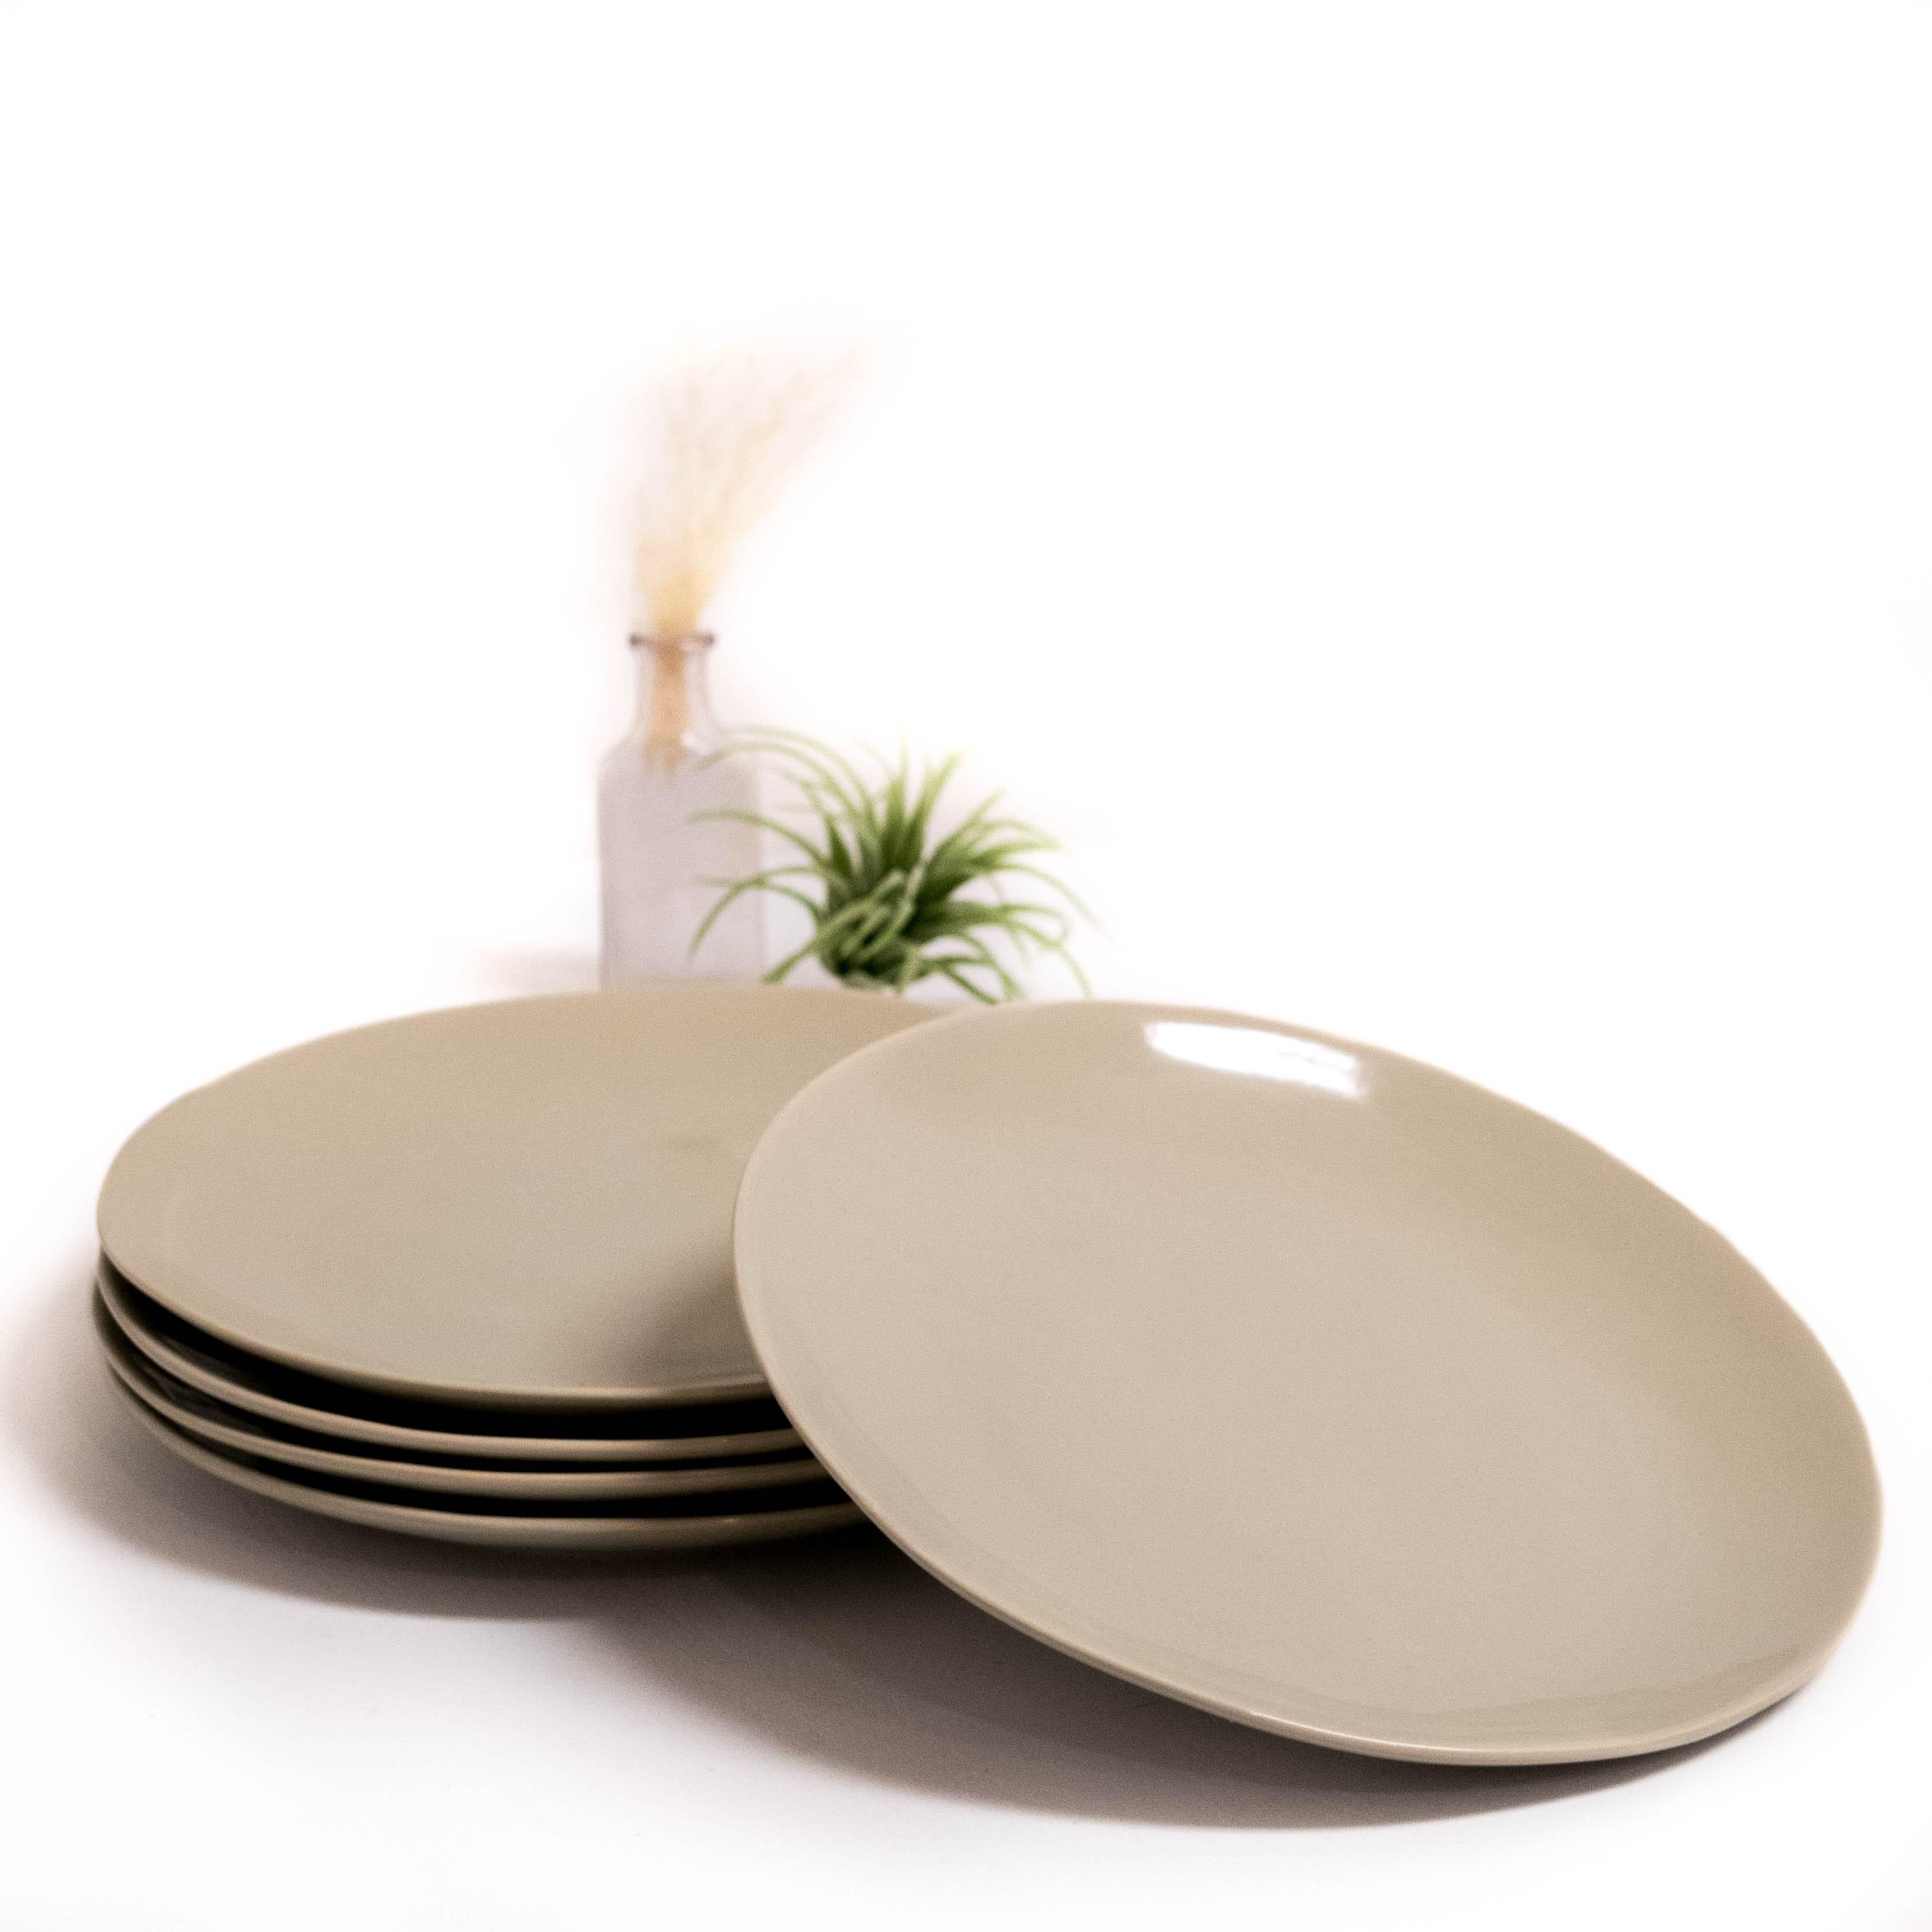 Stone Salad Plates